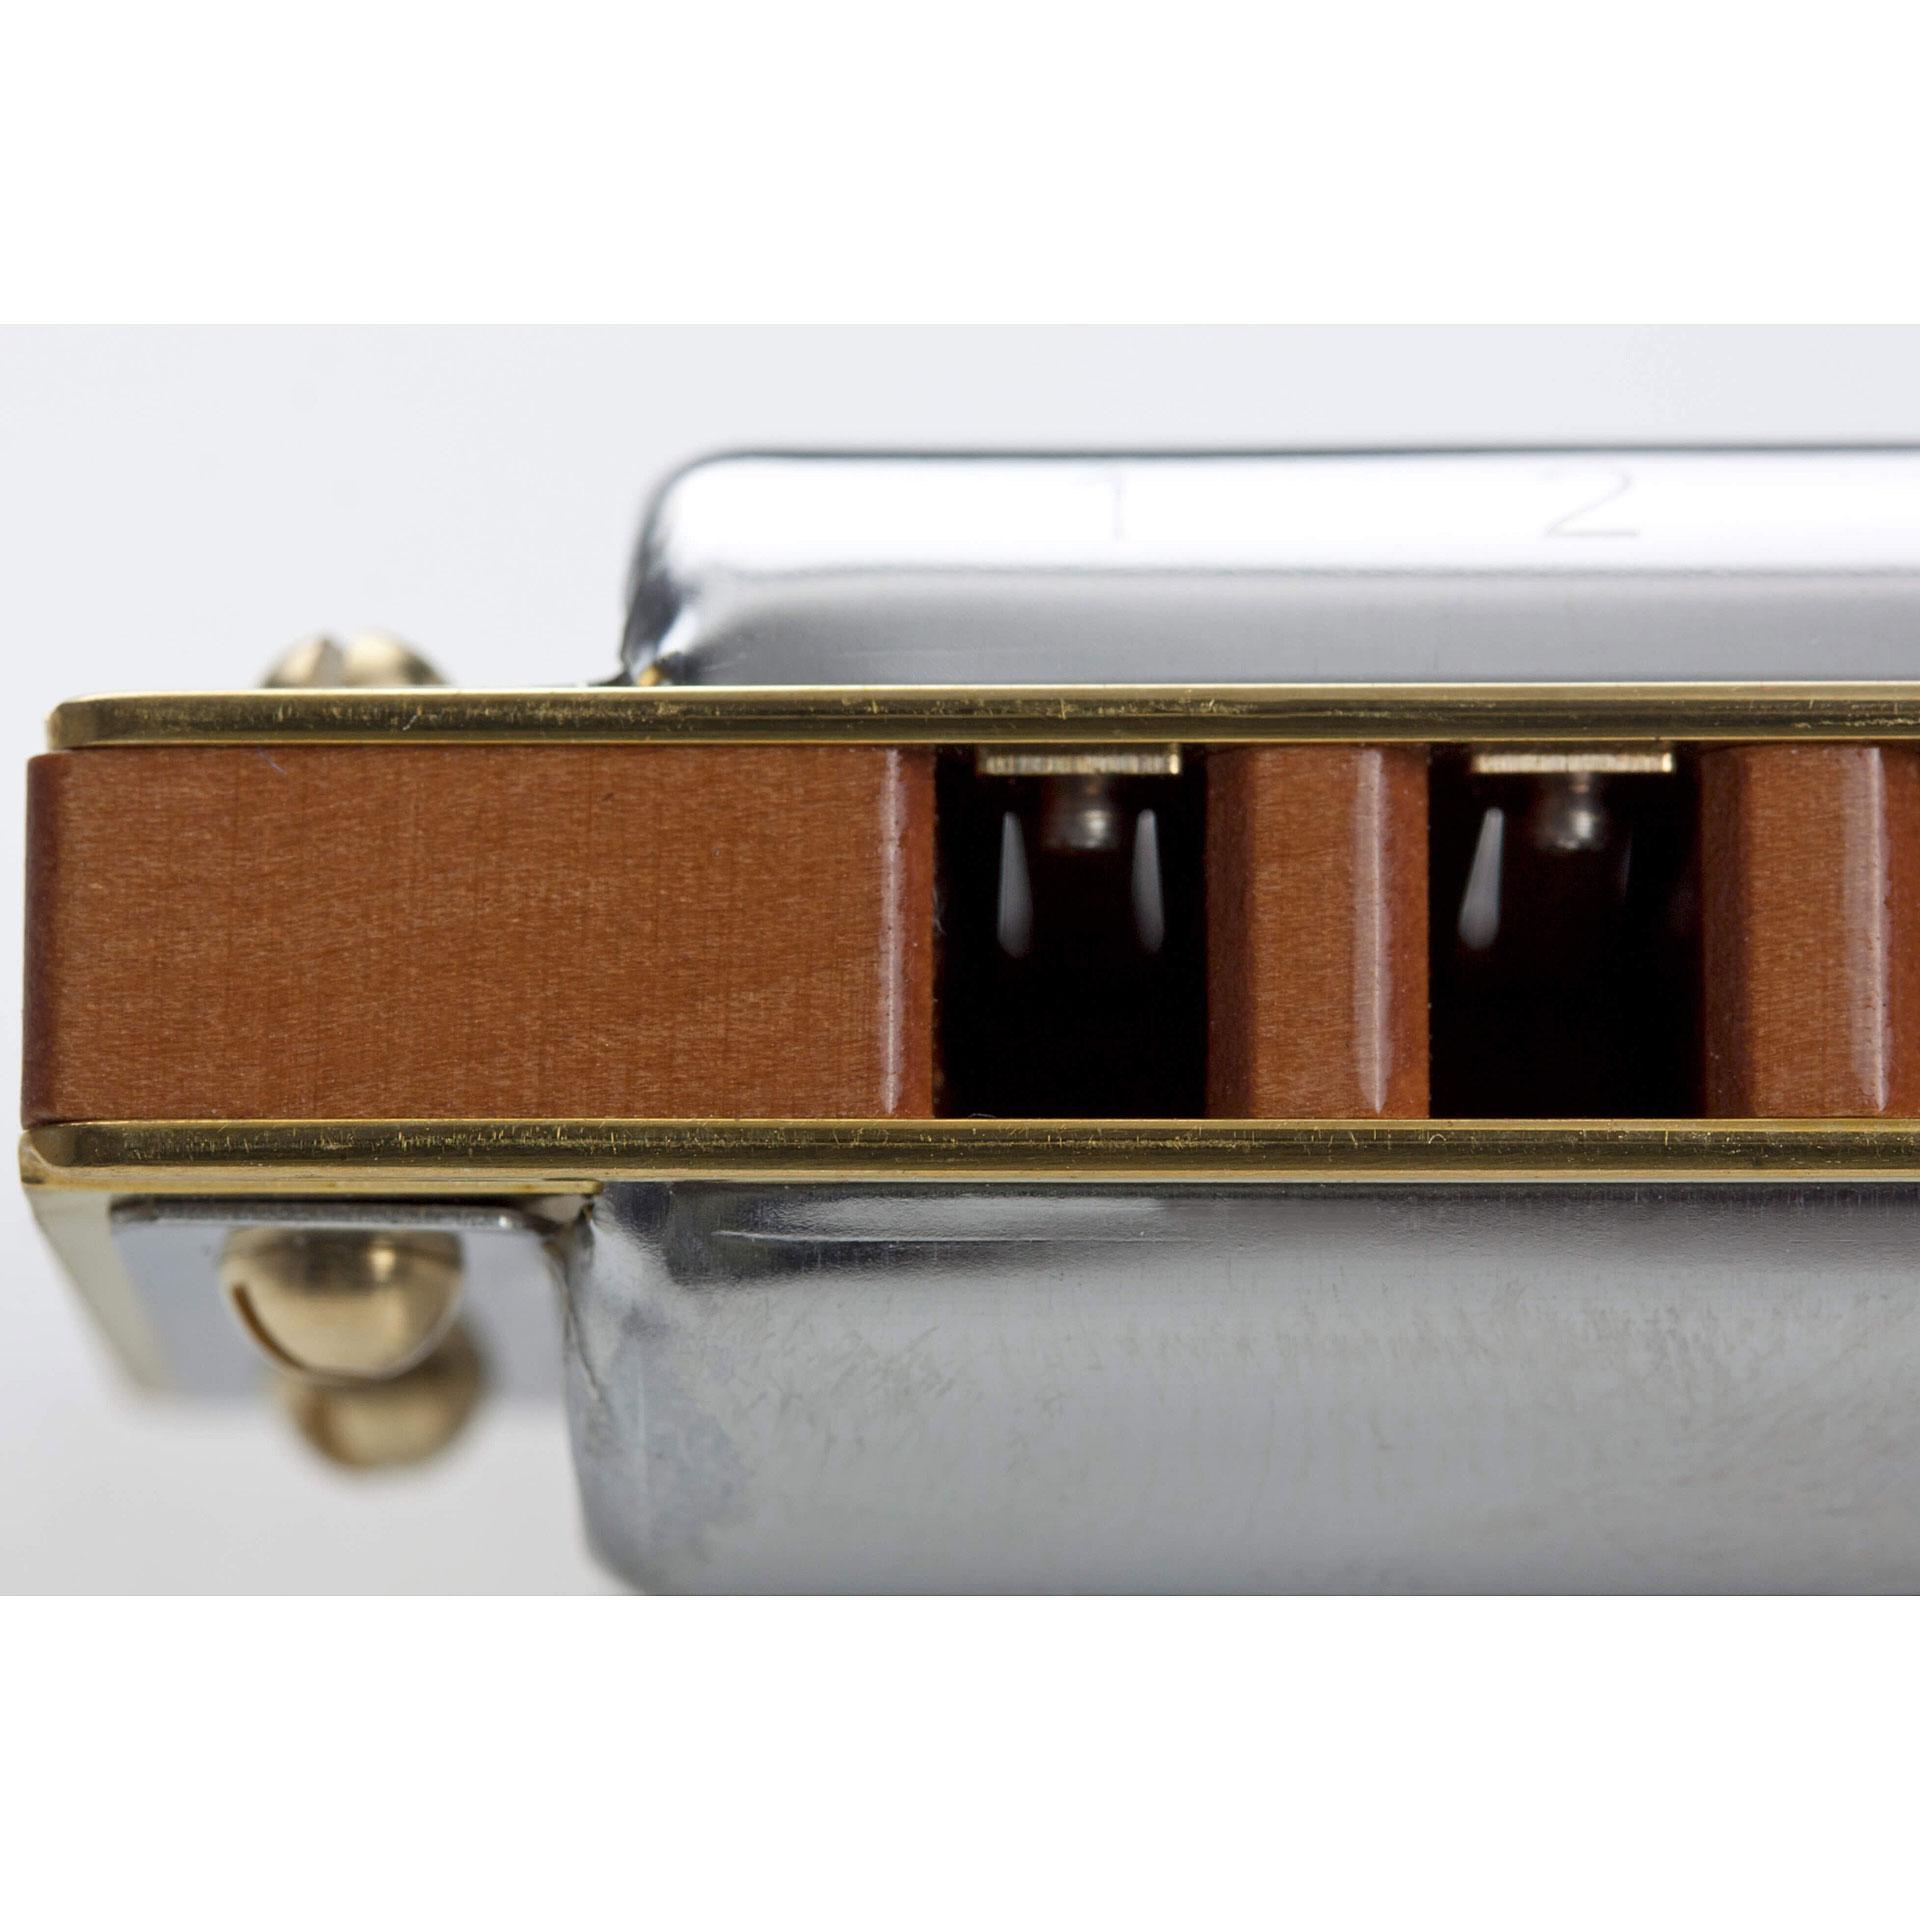 hohner marine band deluxe c richter harmonica. Black Bedroom Furniture Sets. Home Design Ideas